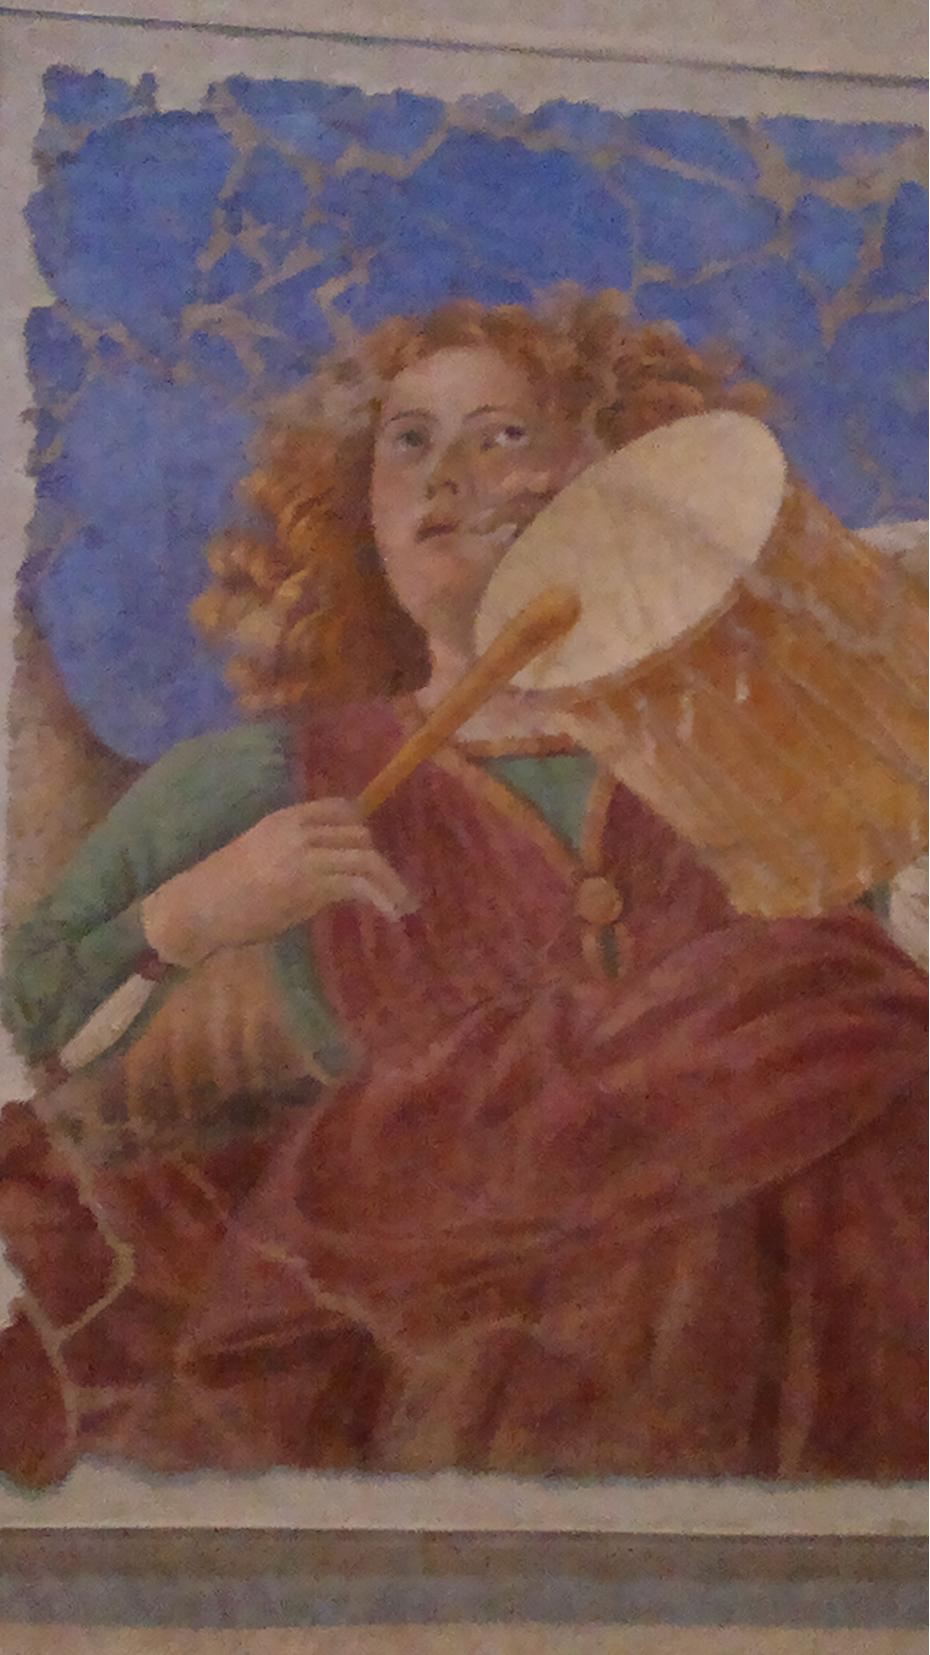 Melozzo da Forlì, Pinacoteca Vaticana